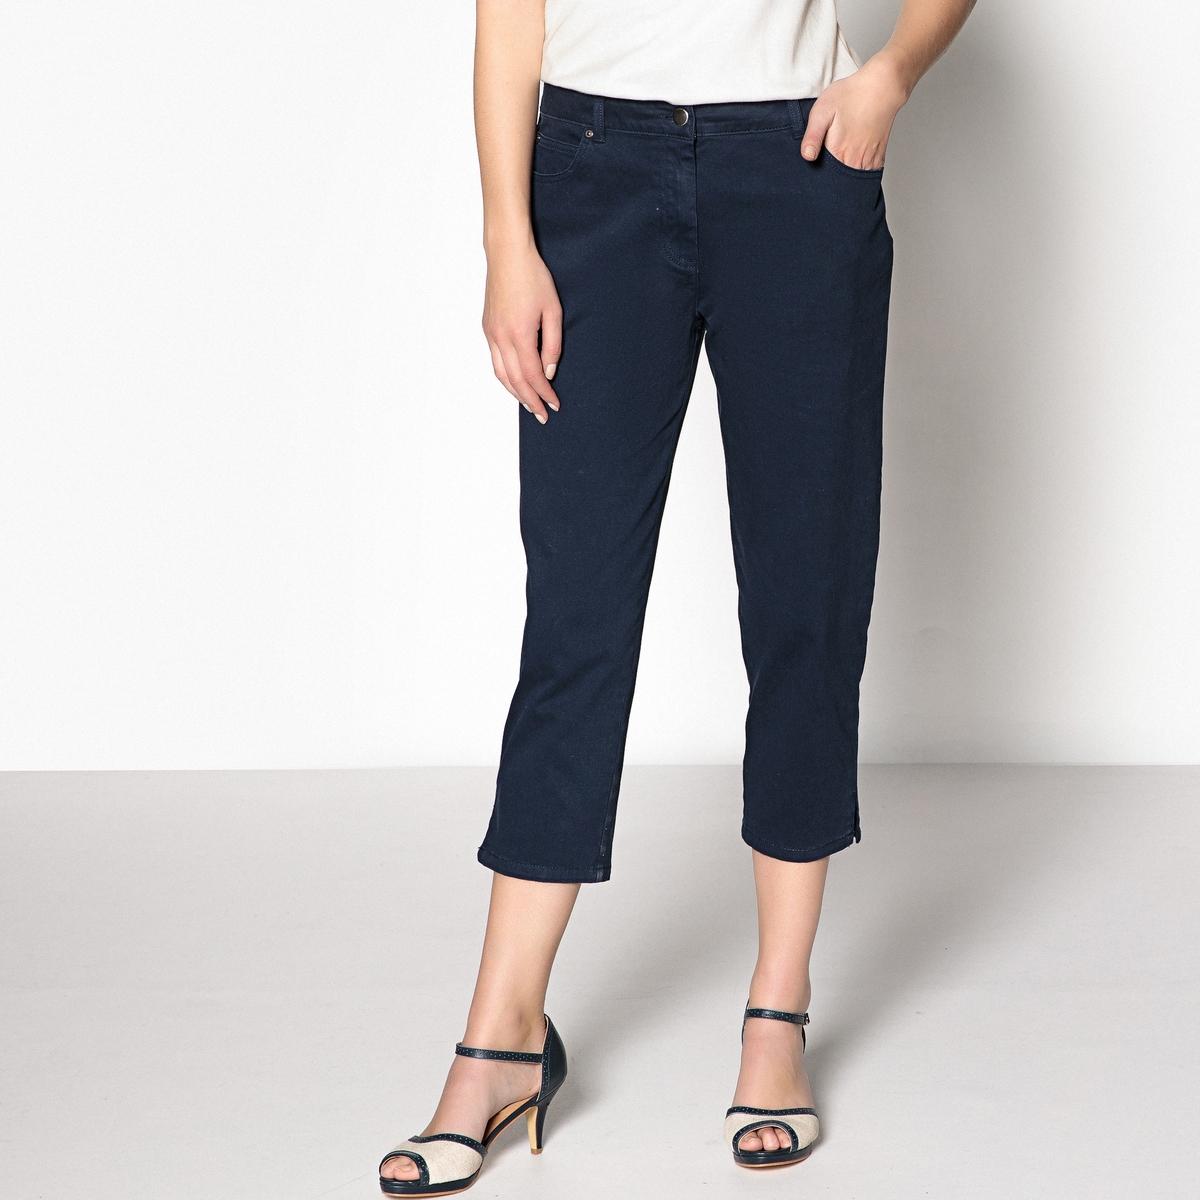 Pantaloni a pinocchietto ricamati, cotone stretch